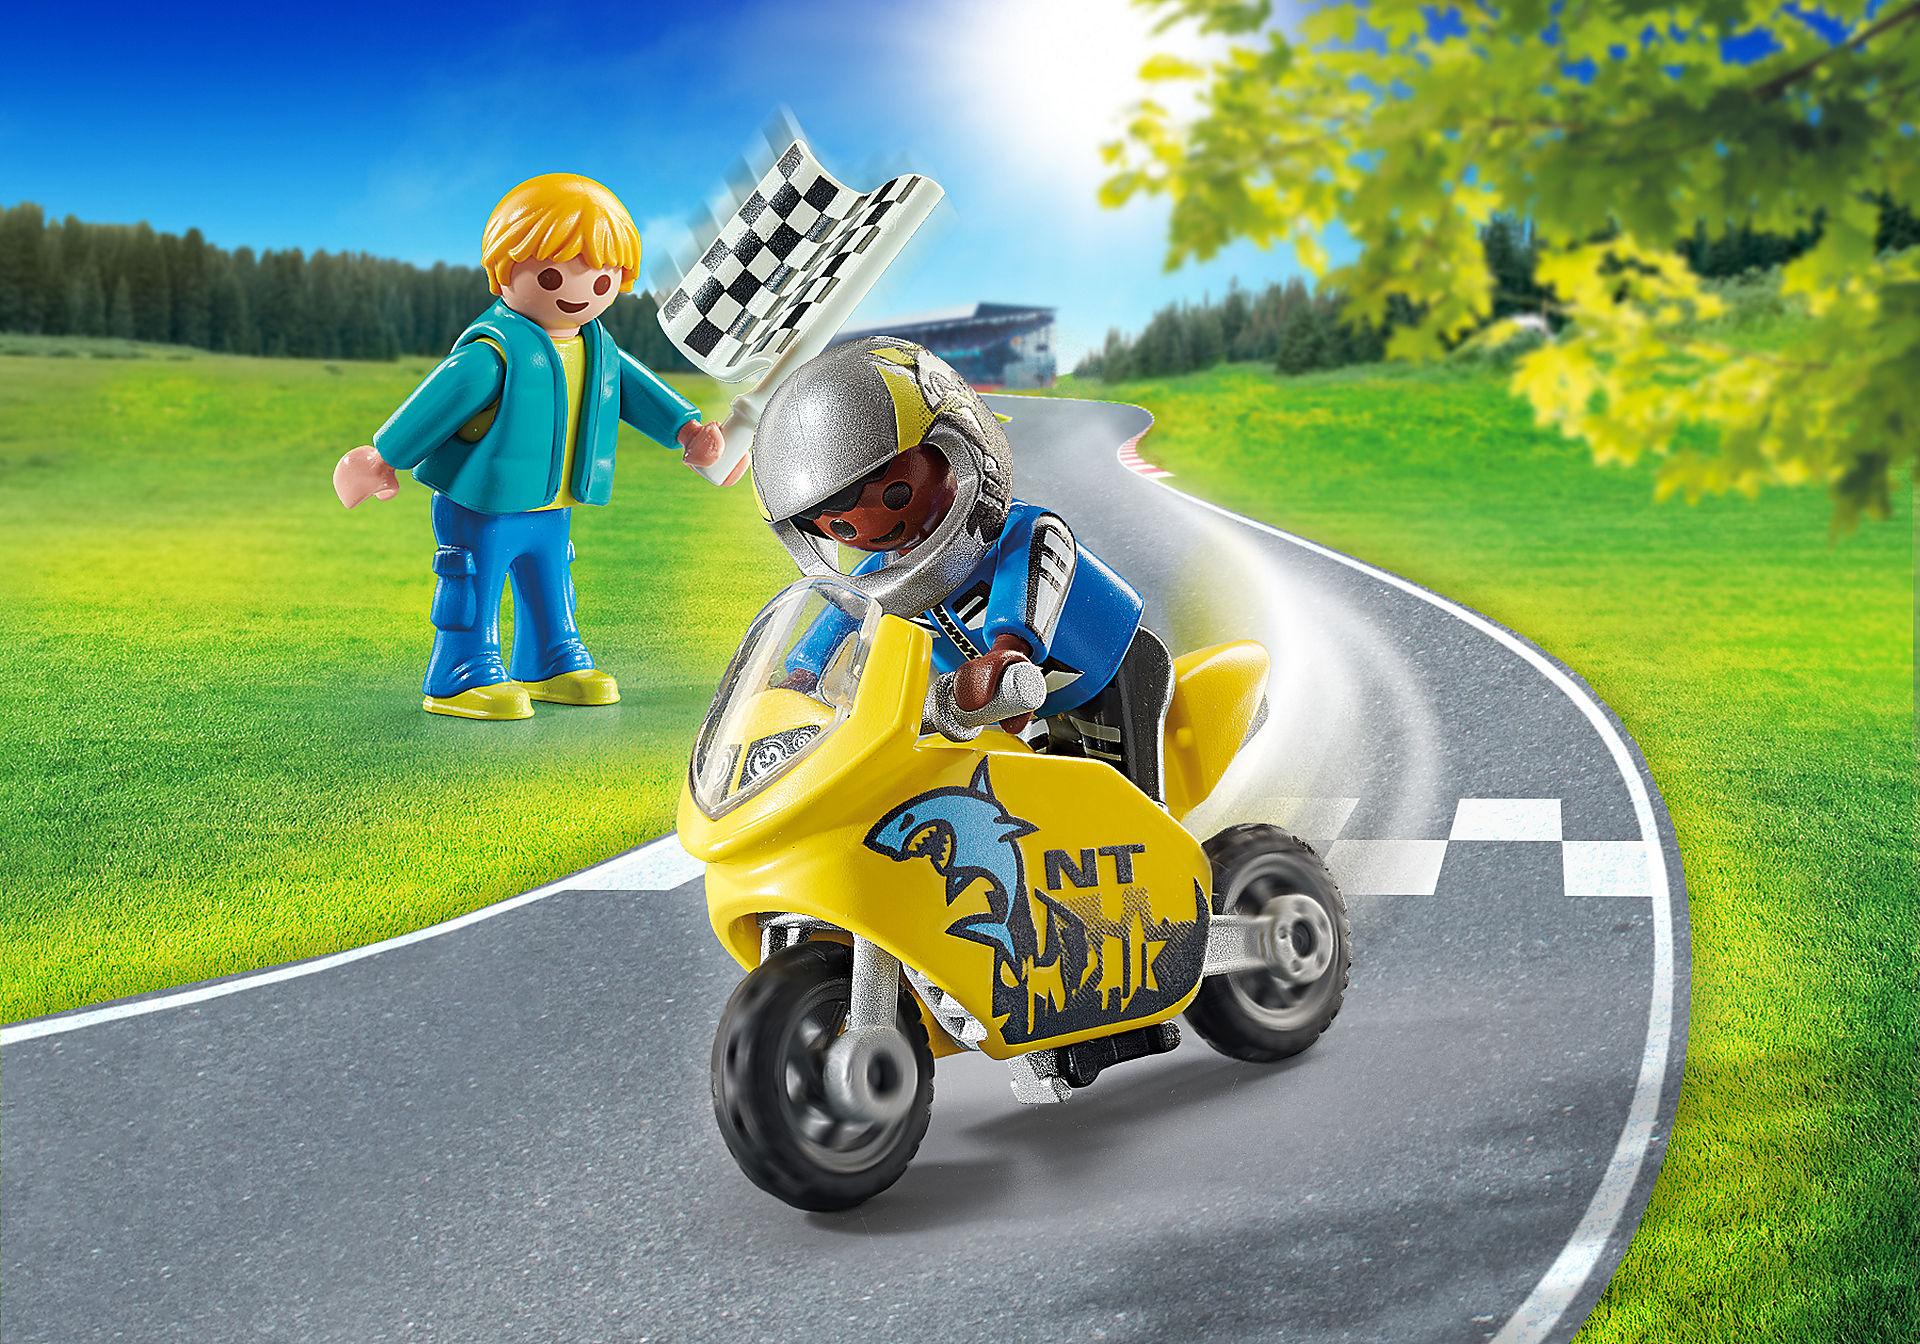 70380 Jungs mit Racingbike zoom image1